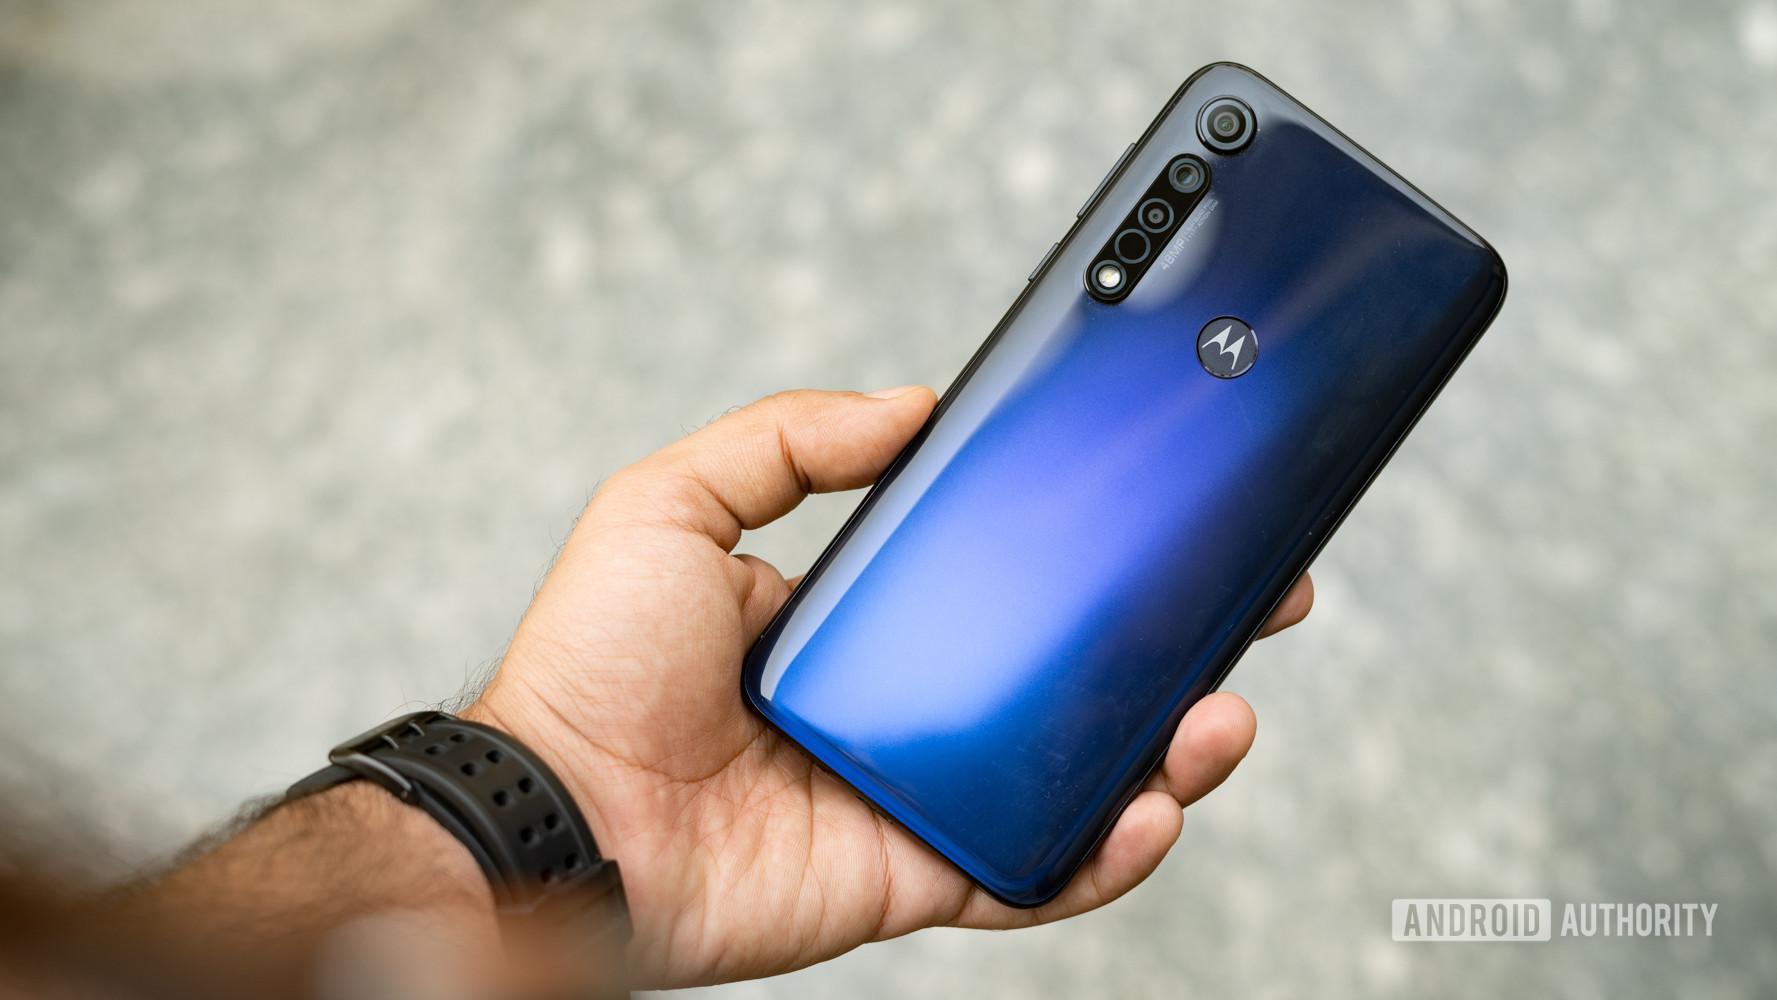 Moto G8 Plus in hand